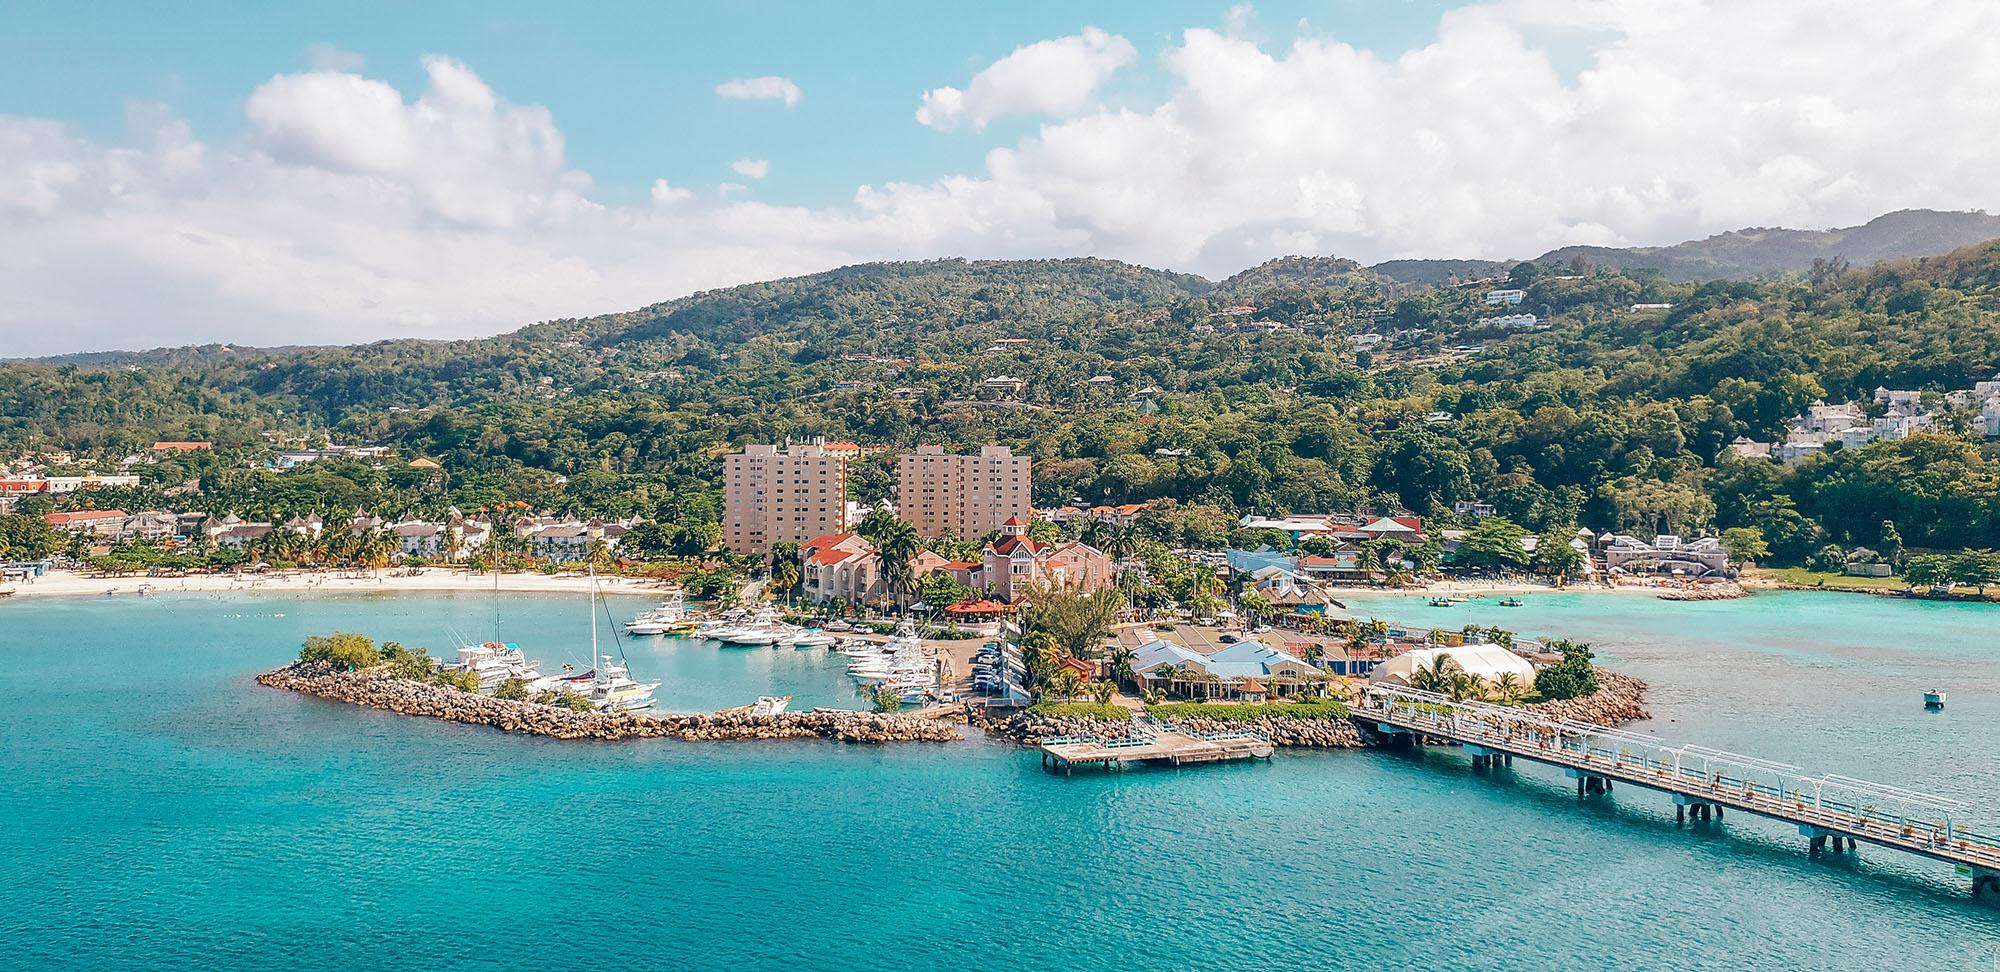 Mittelamerika Kreuzfahrt Ocho Rios Jamaika Hafen